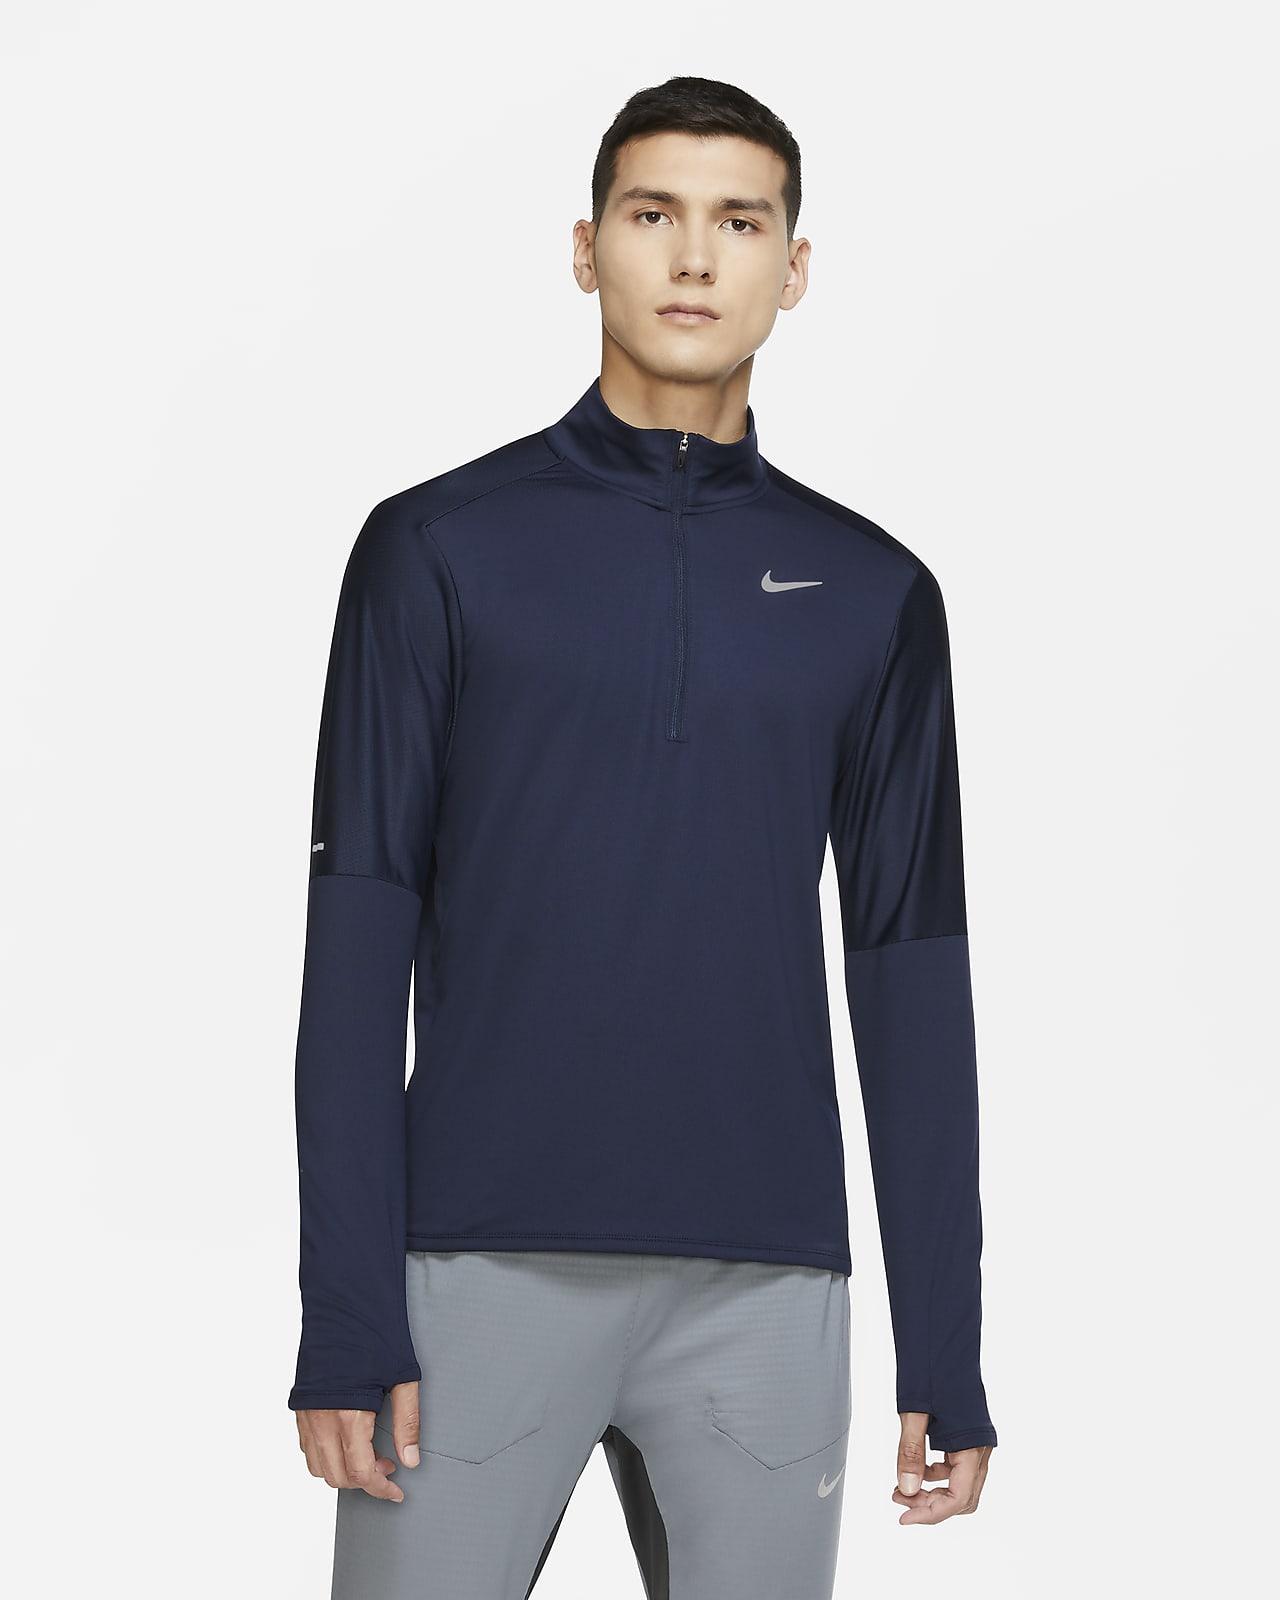 Nike Dri-FIT Camiseta de running con media cremallera - Hombre